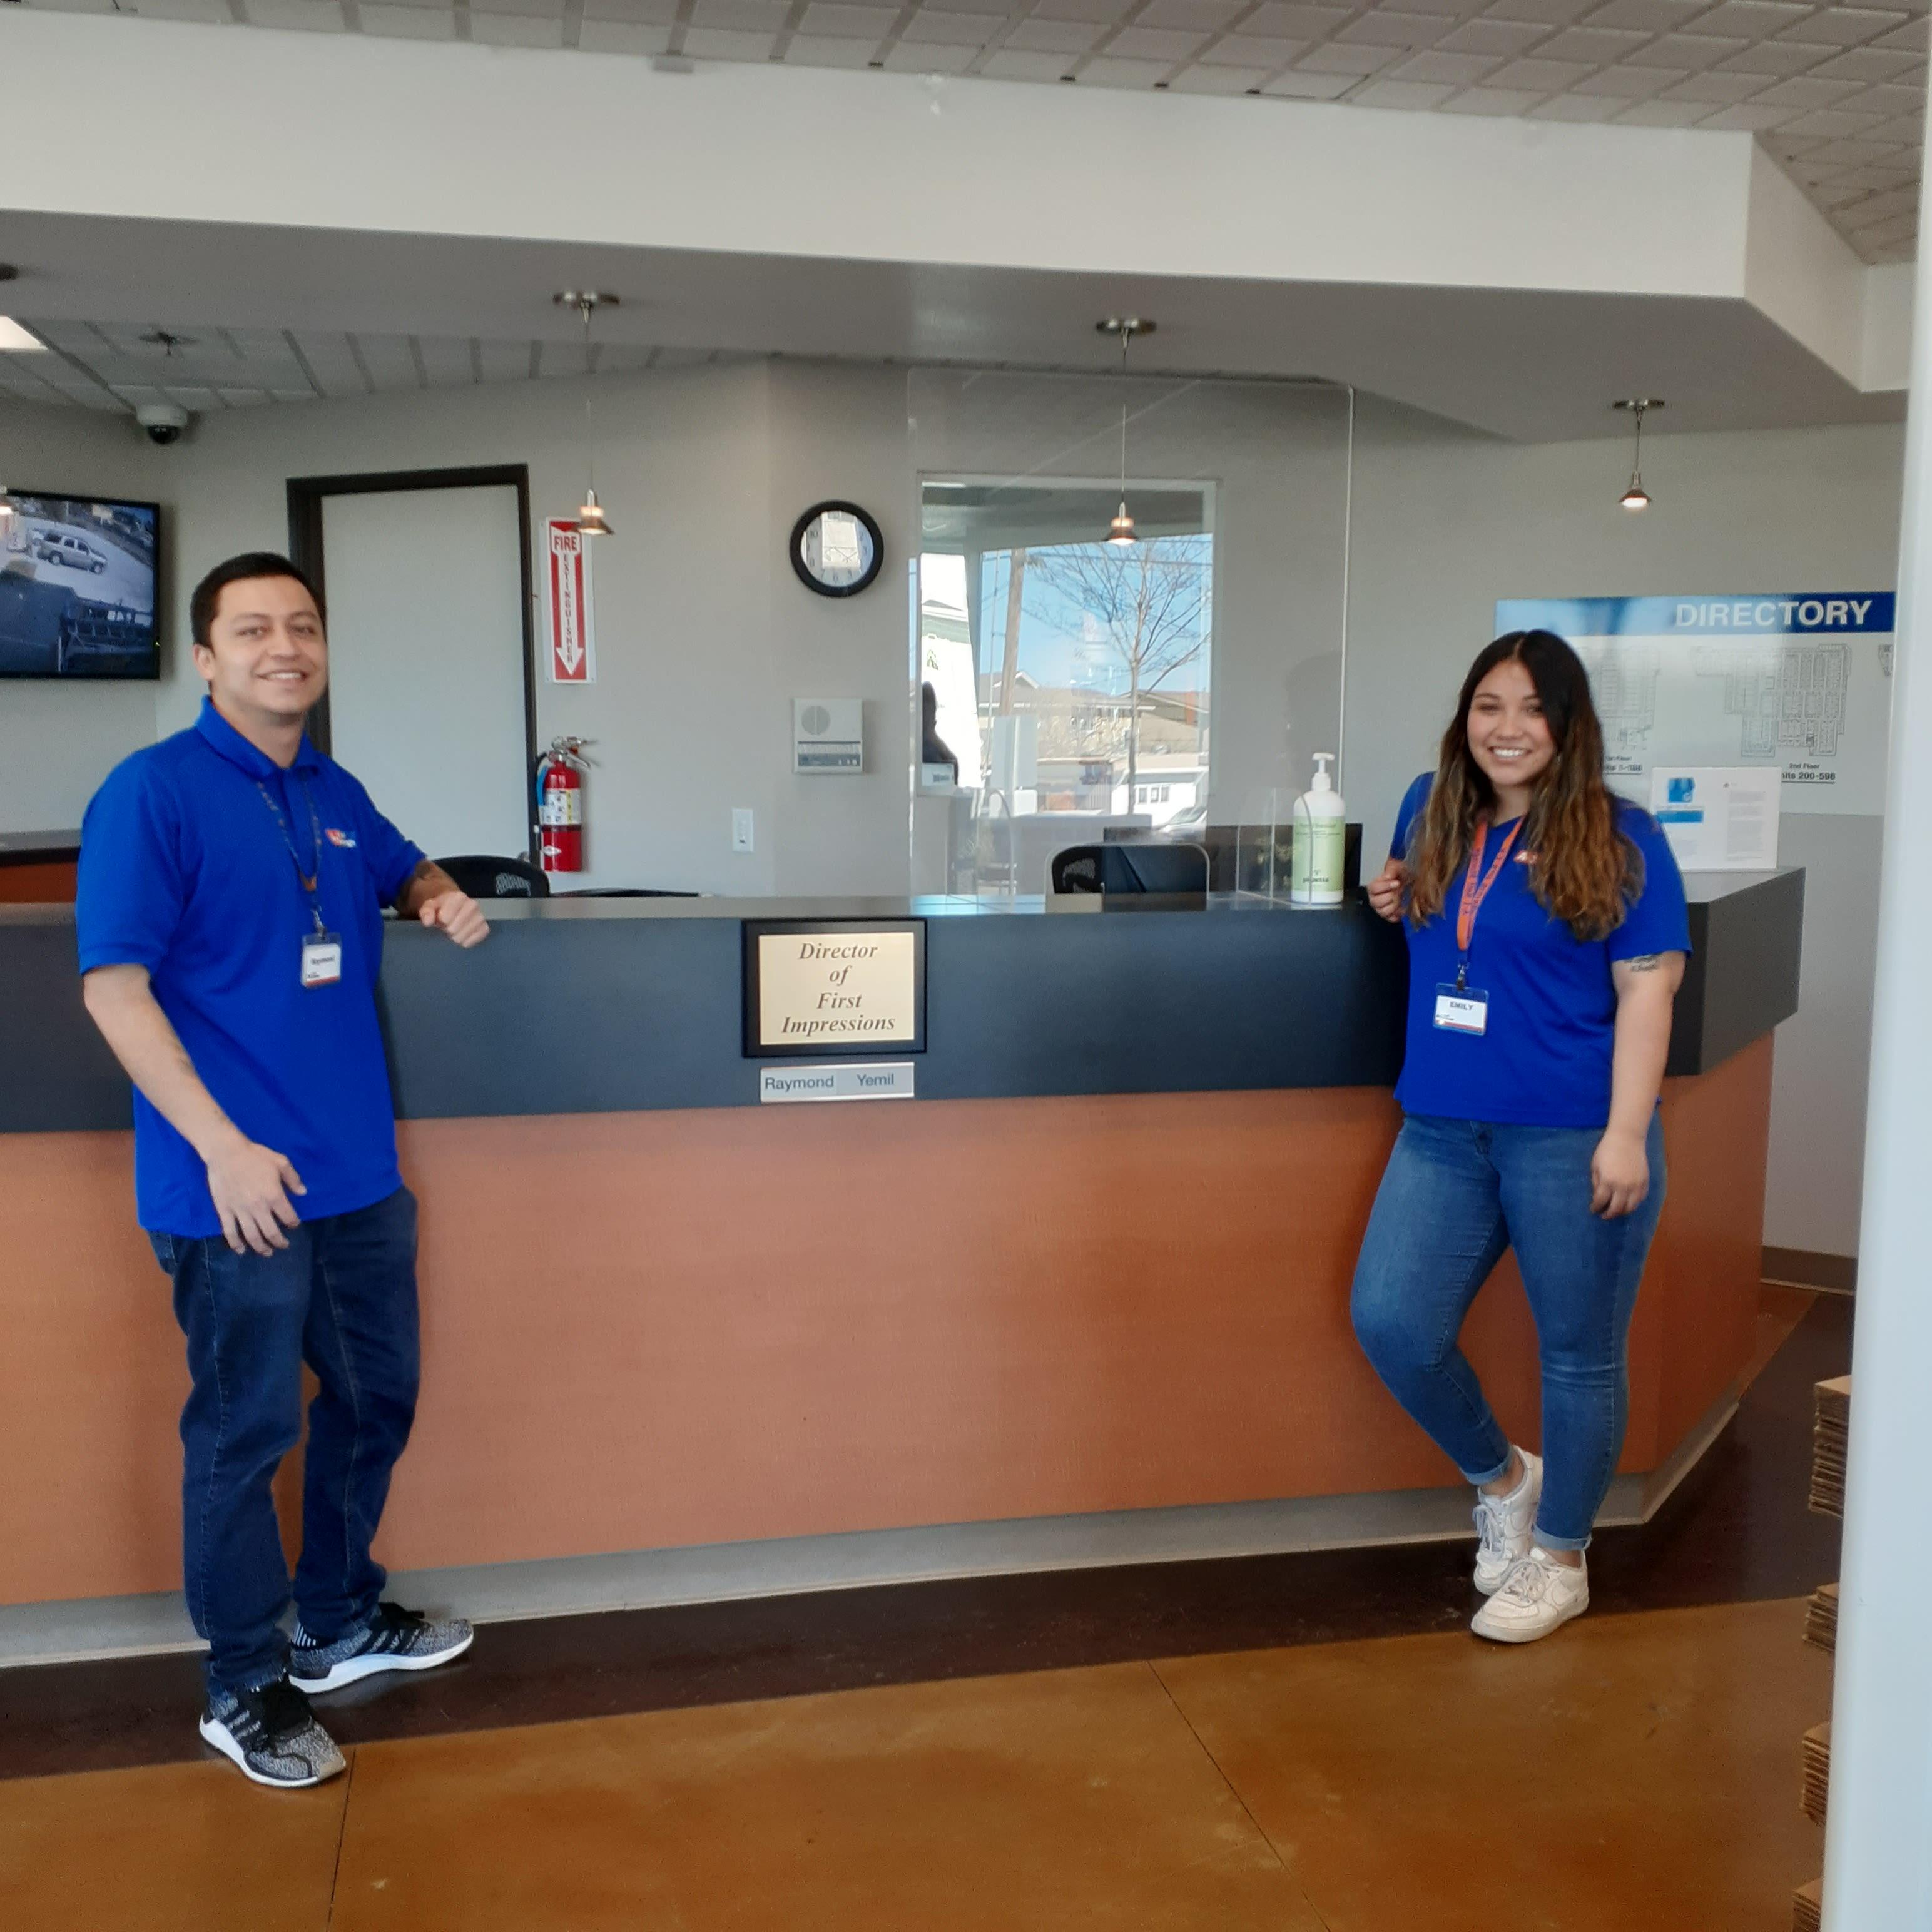 Customer service staff in San Diego, CA | A-1 Self Storage